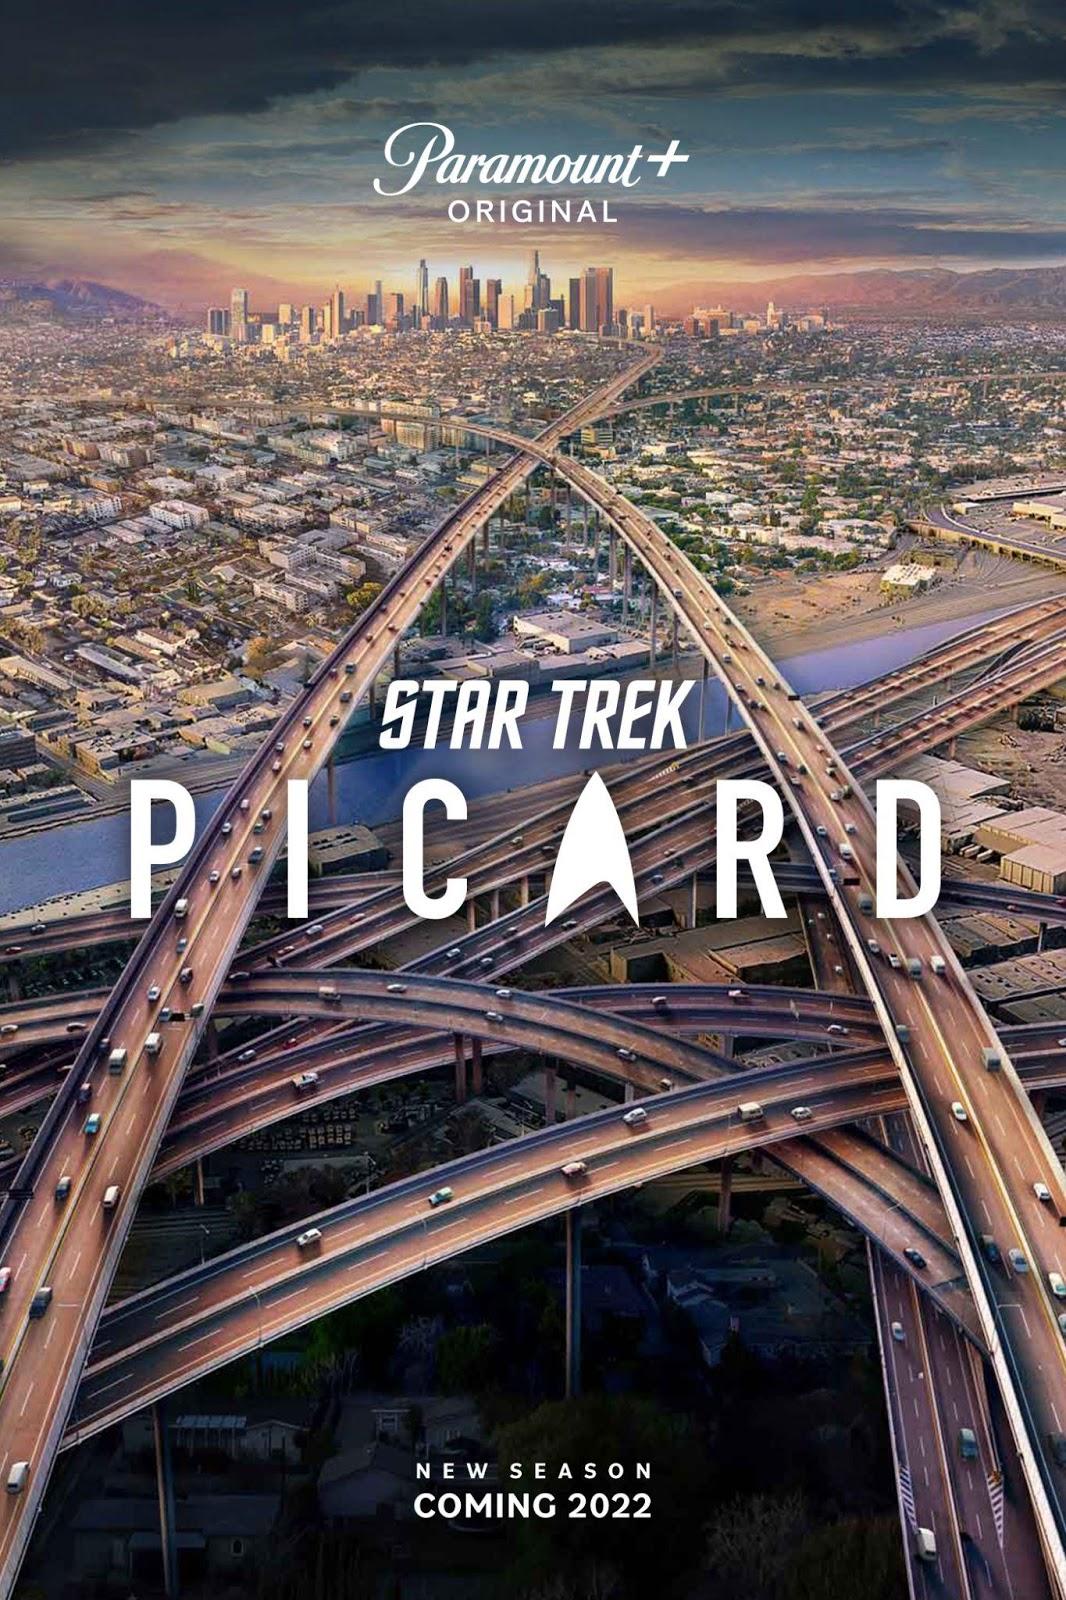 Star Trek: Picard Season 2 Poster